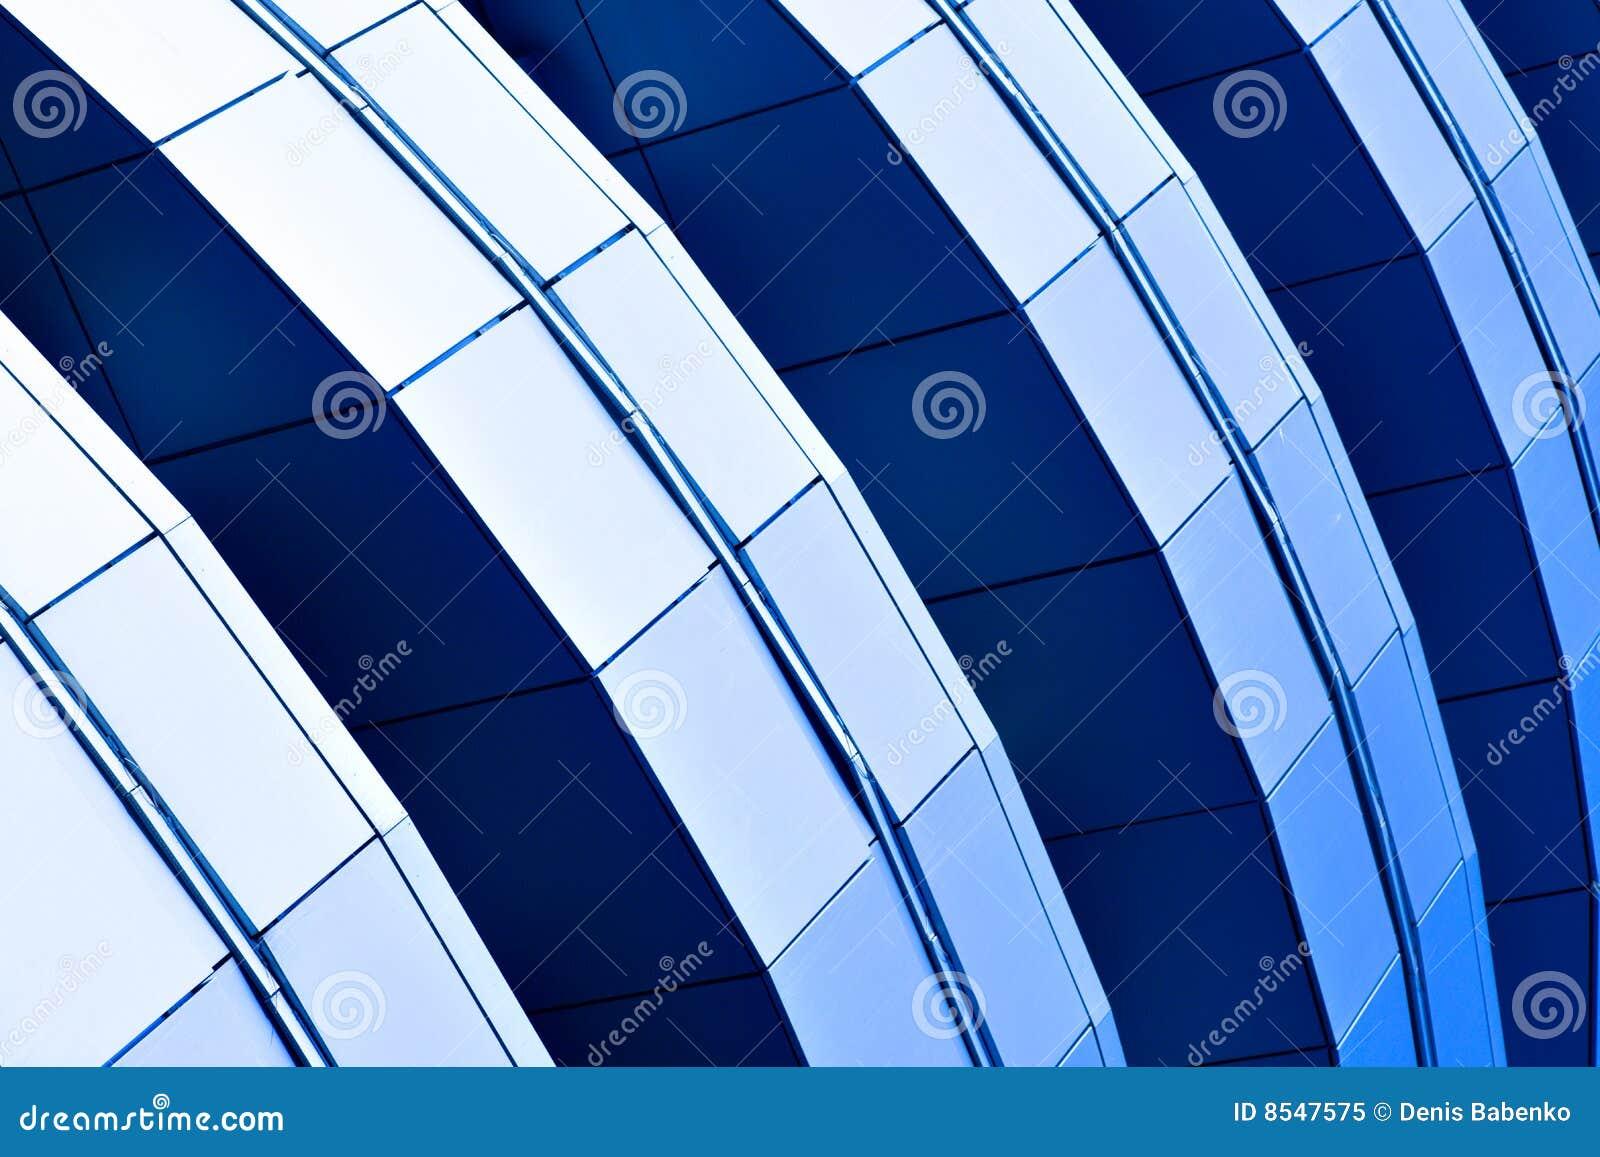 Abstract Diagonal Crop Of Skyscraper Stock Image - Image ...